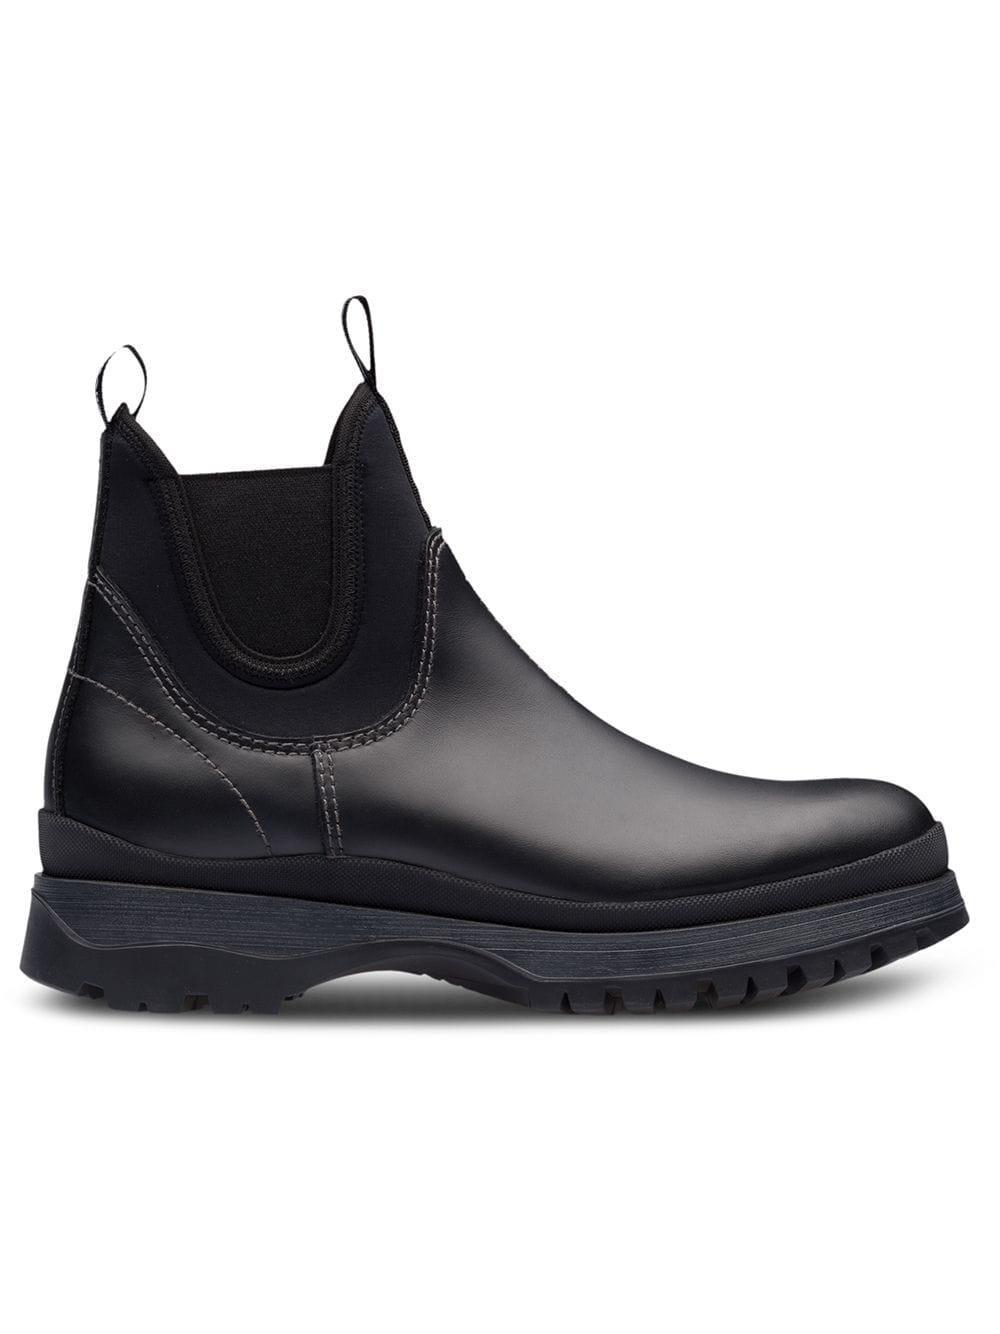 a1aa78282ae6 Prada Paneled Neoprene And Leather Chelsea Boots In Black | ModeSens